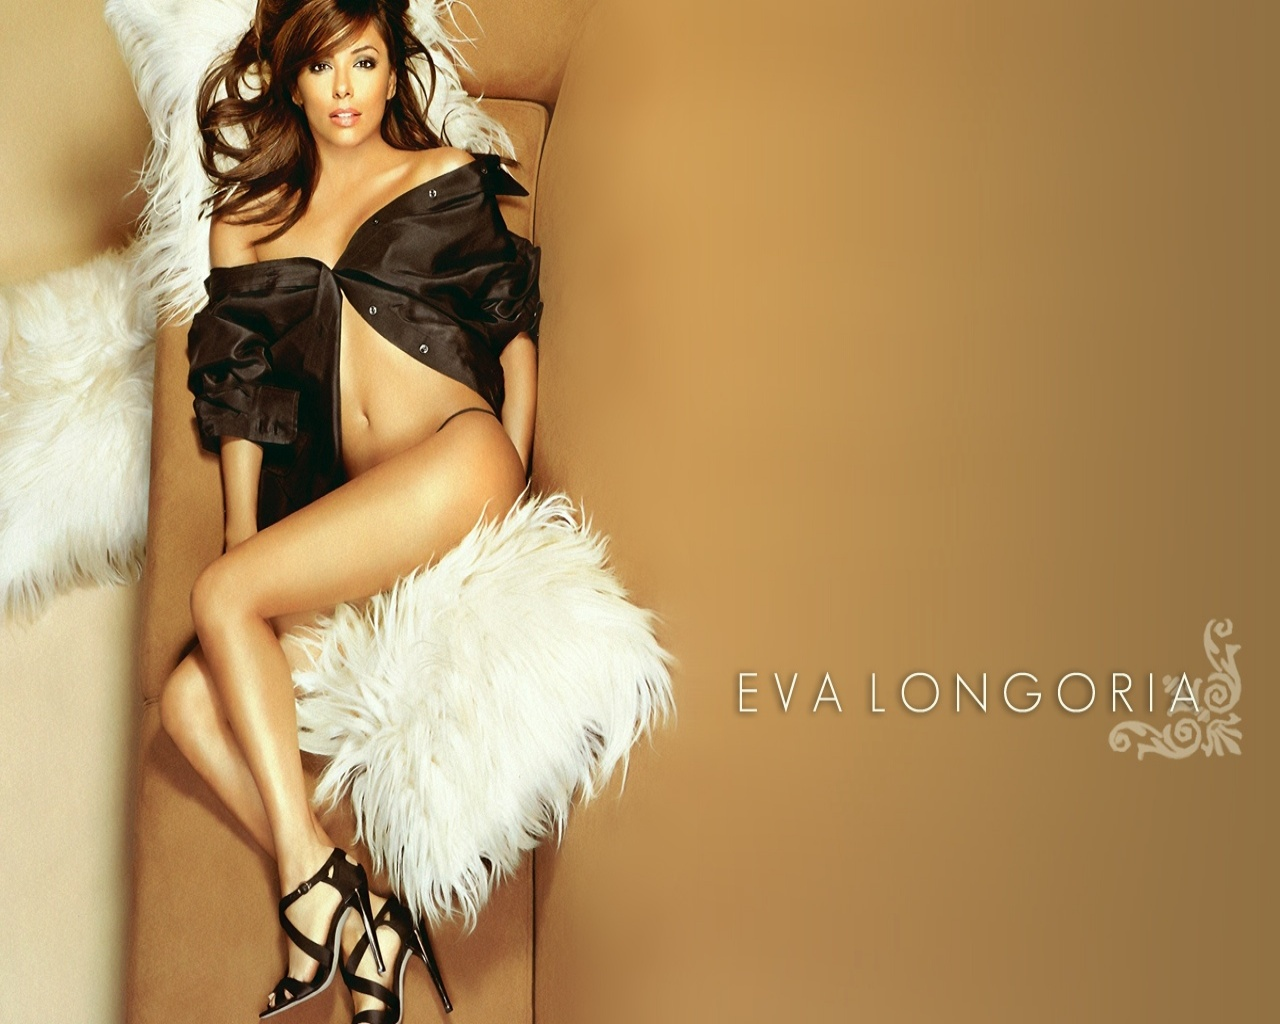 http://2.bp.blogspot.com/_jJPqWg6V3Y8/TUlr1ApSdmI/AAAAAAAAEMQ/18VXXBDIOfw/s1600/eva_longoria_hot_wallpapers_23.jpg